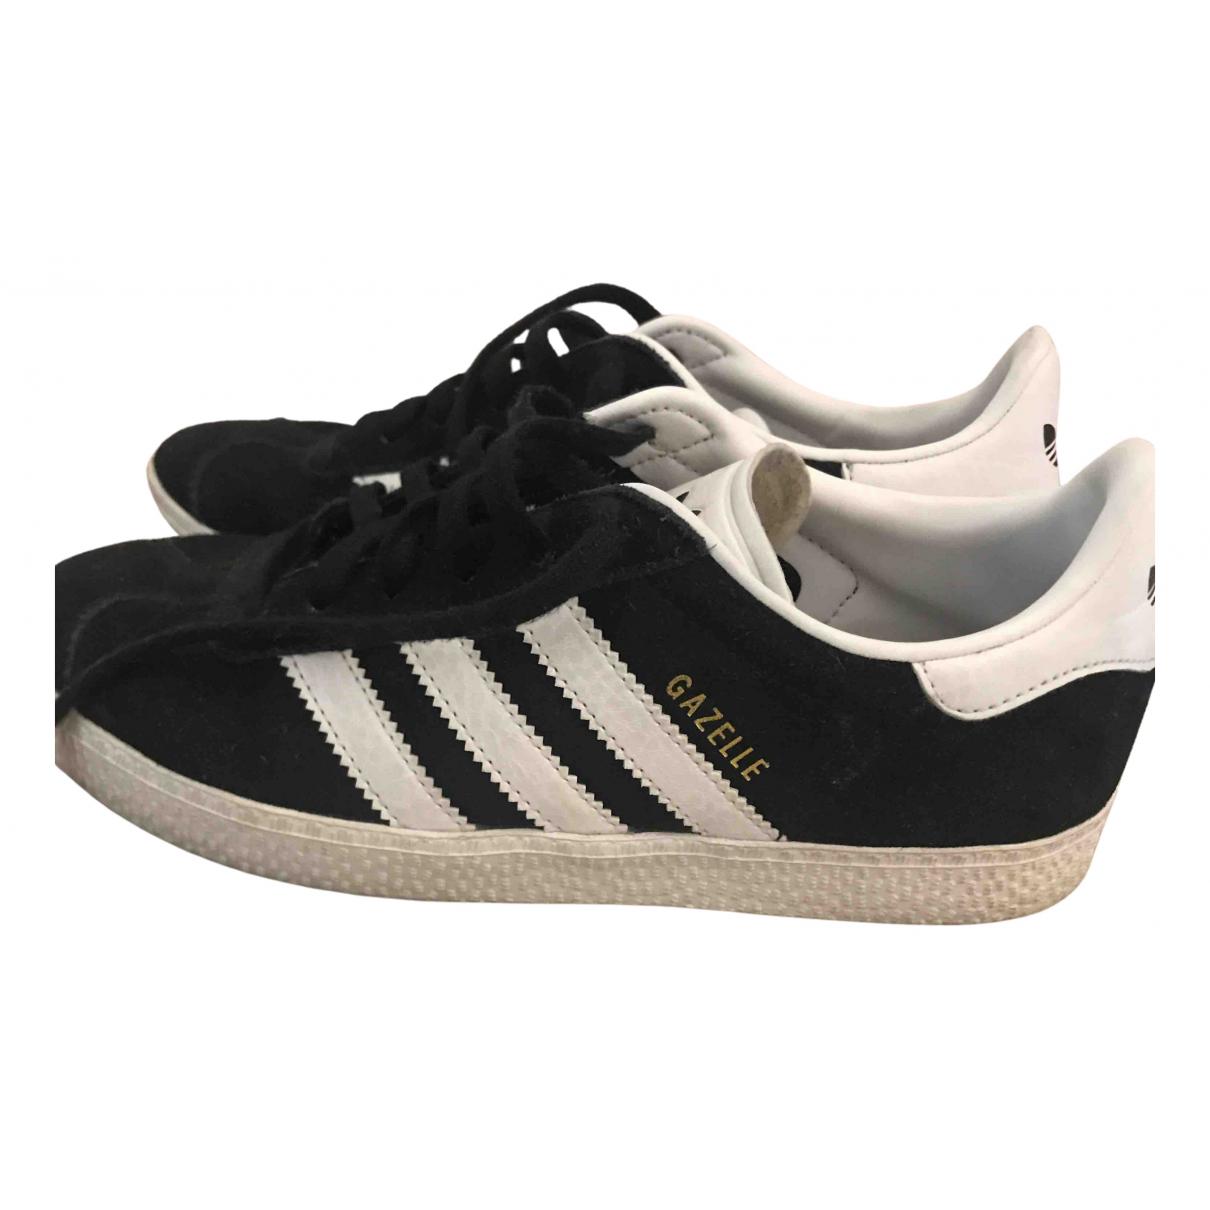 Adidas Gazelle Black Leather Trainers for Women 35 EU